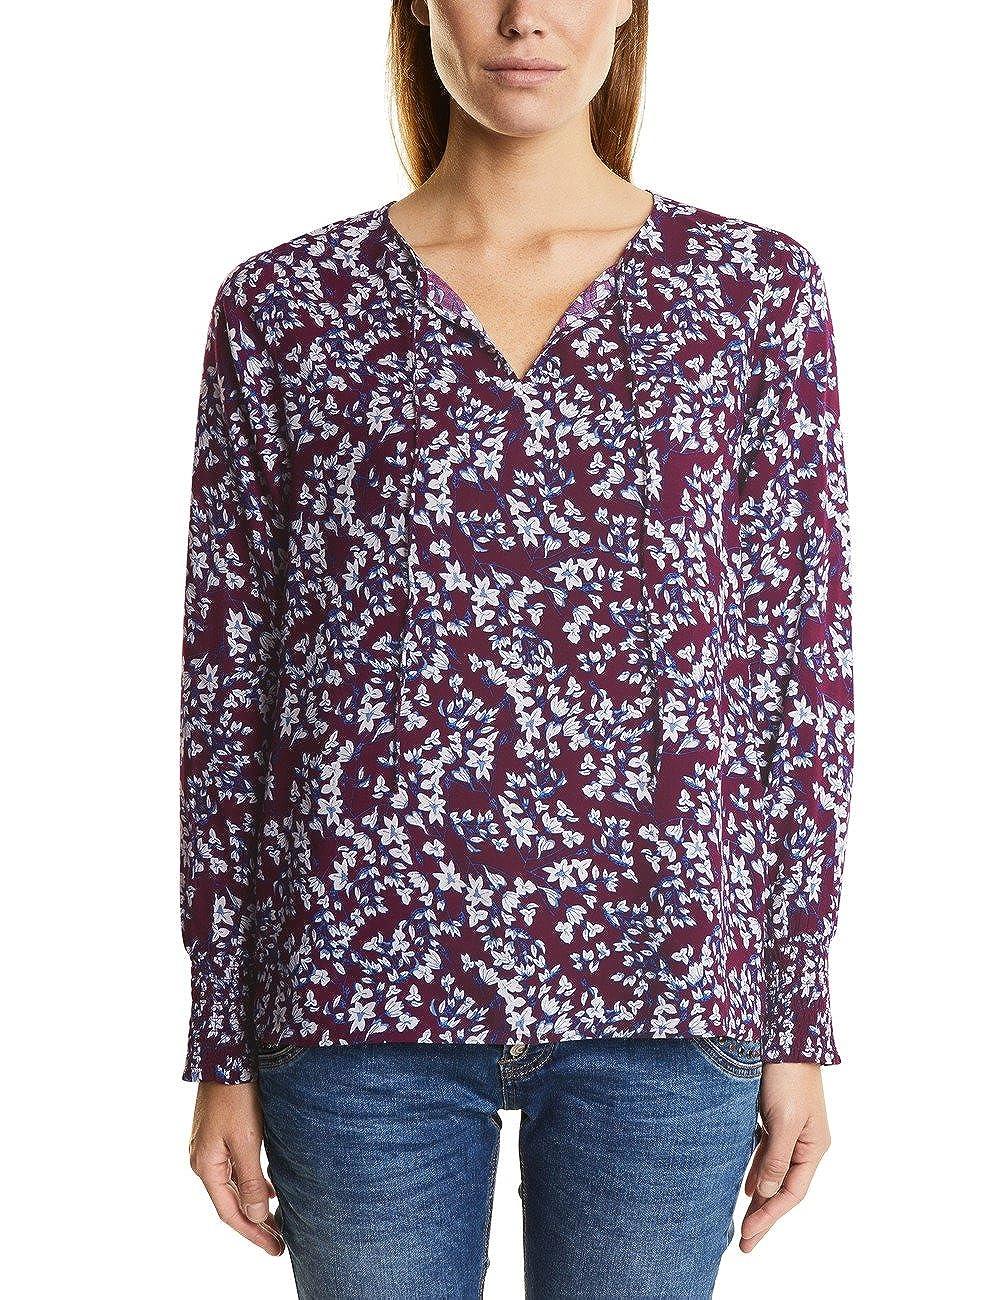 TALLA 36 (Talla Del Fabricante: 34). Street One Flower-Print Blouse Smok-Cuff Blusa para Mujer